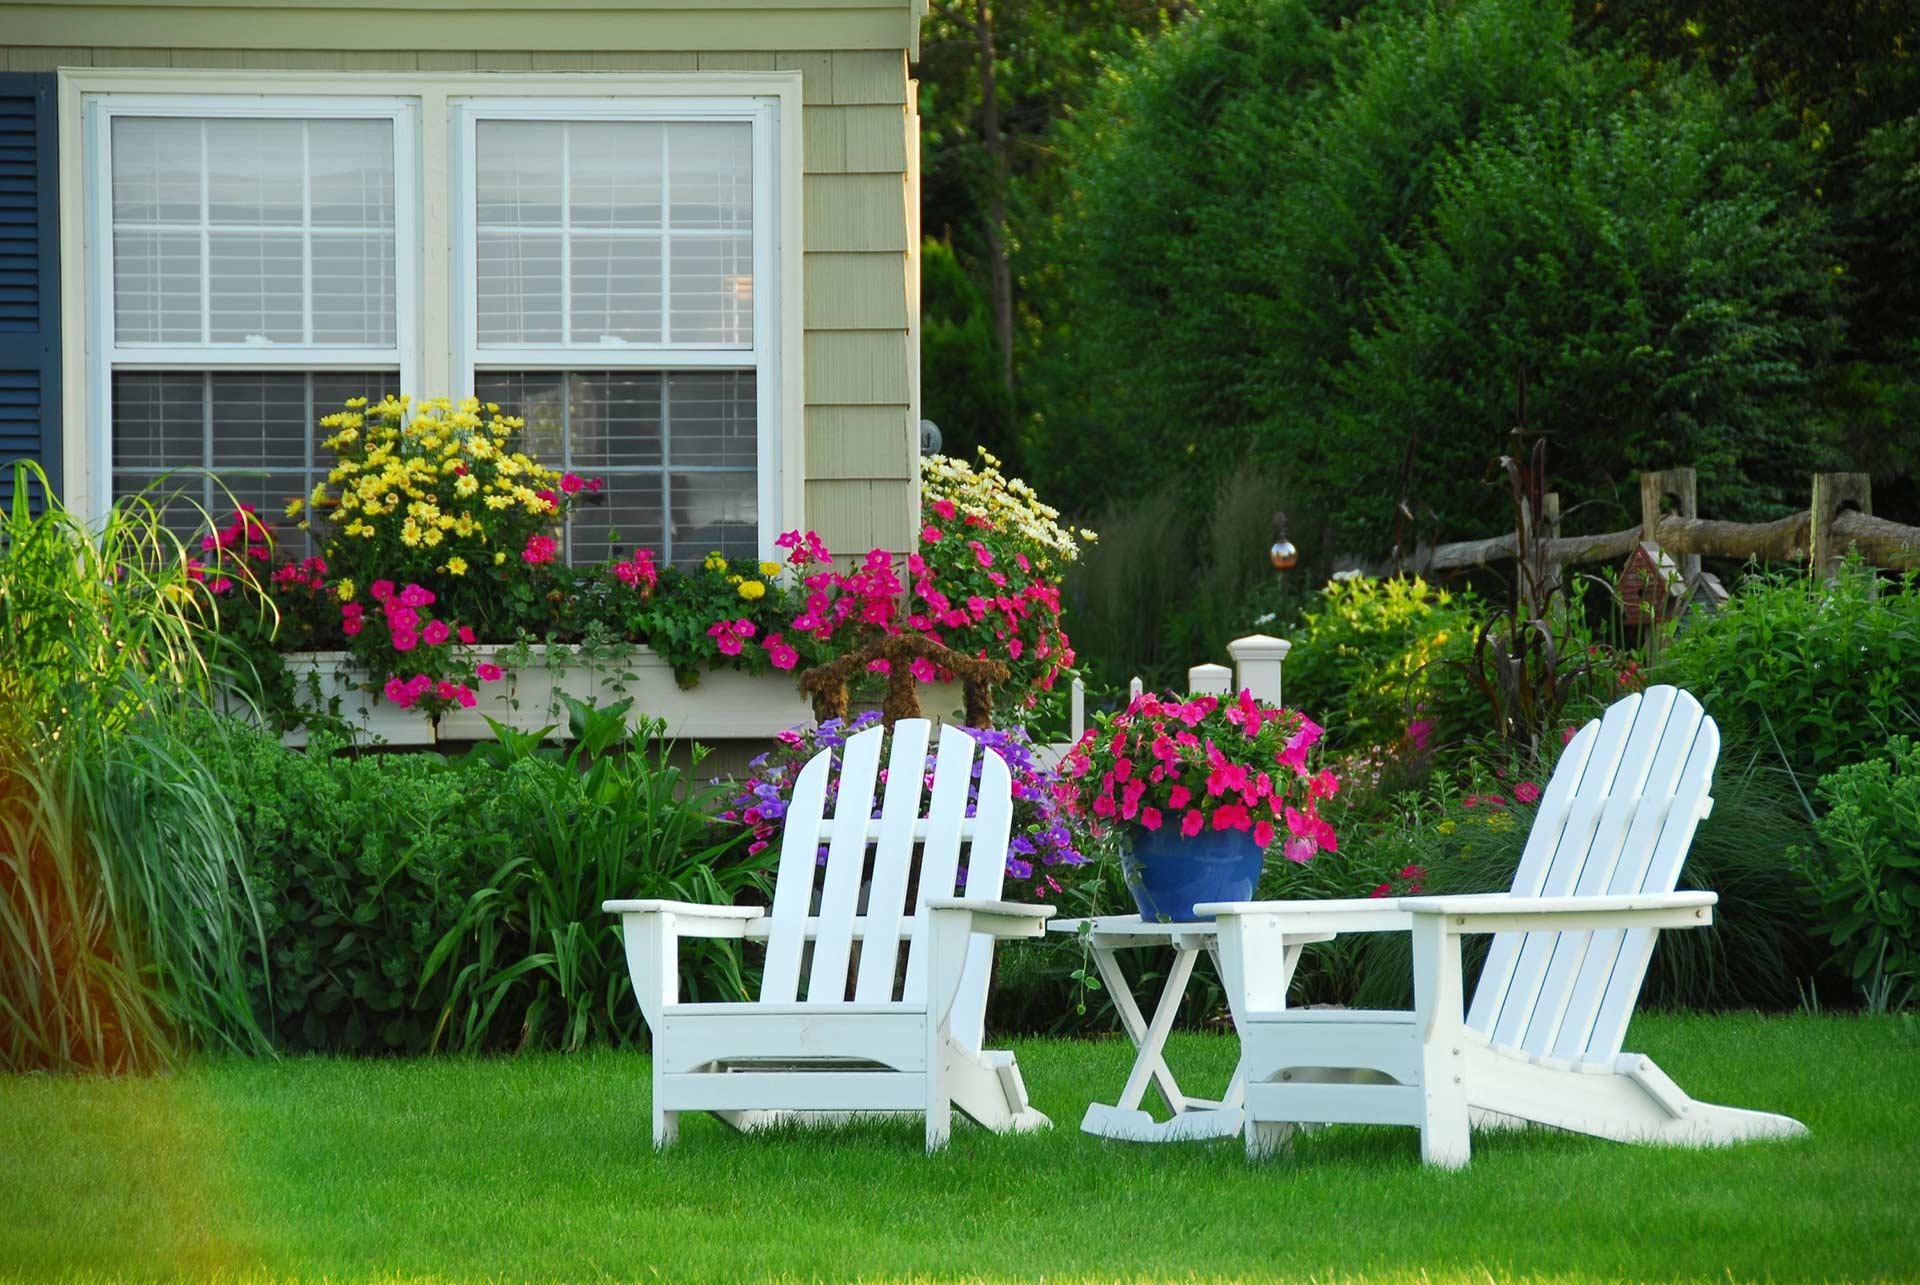 white adirondack chairs in a backyard